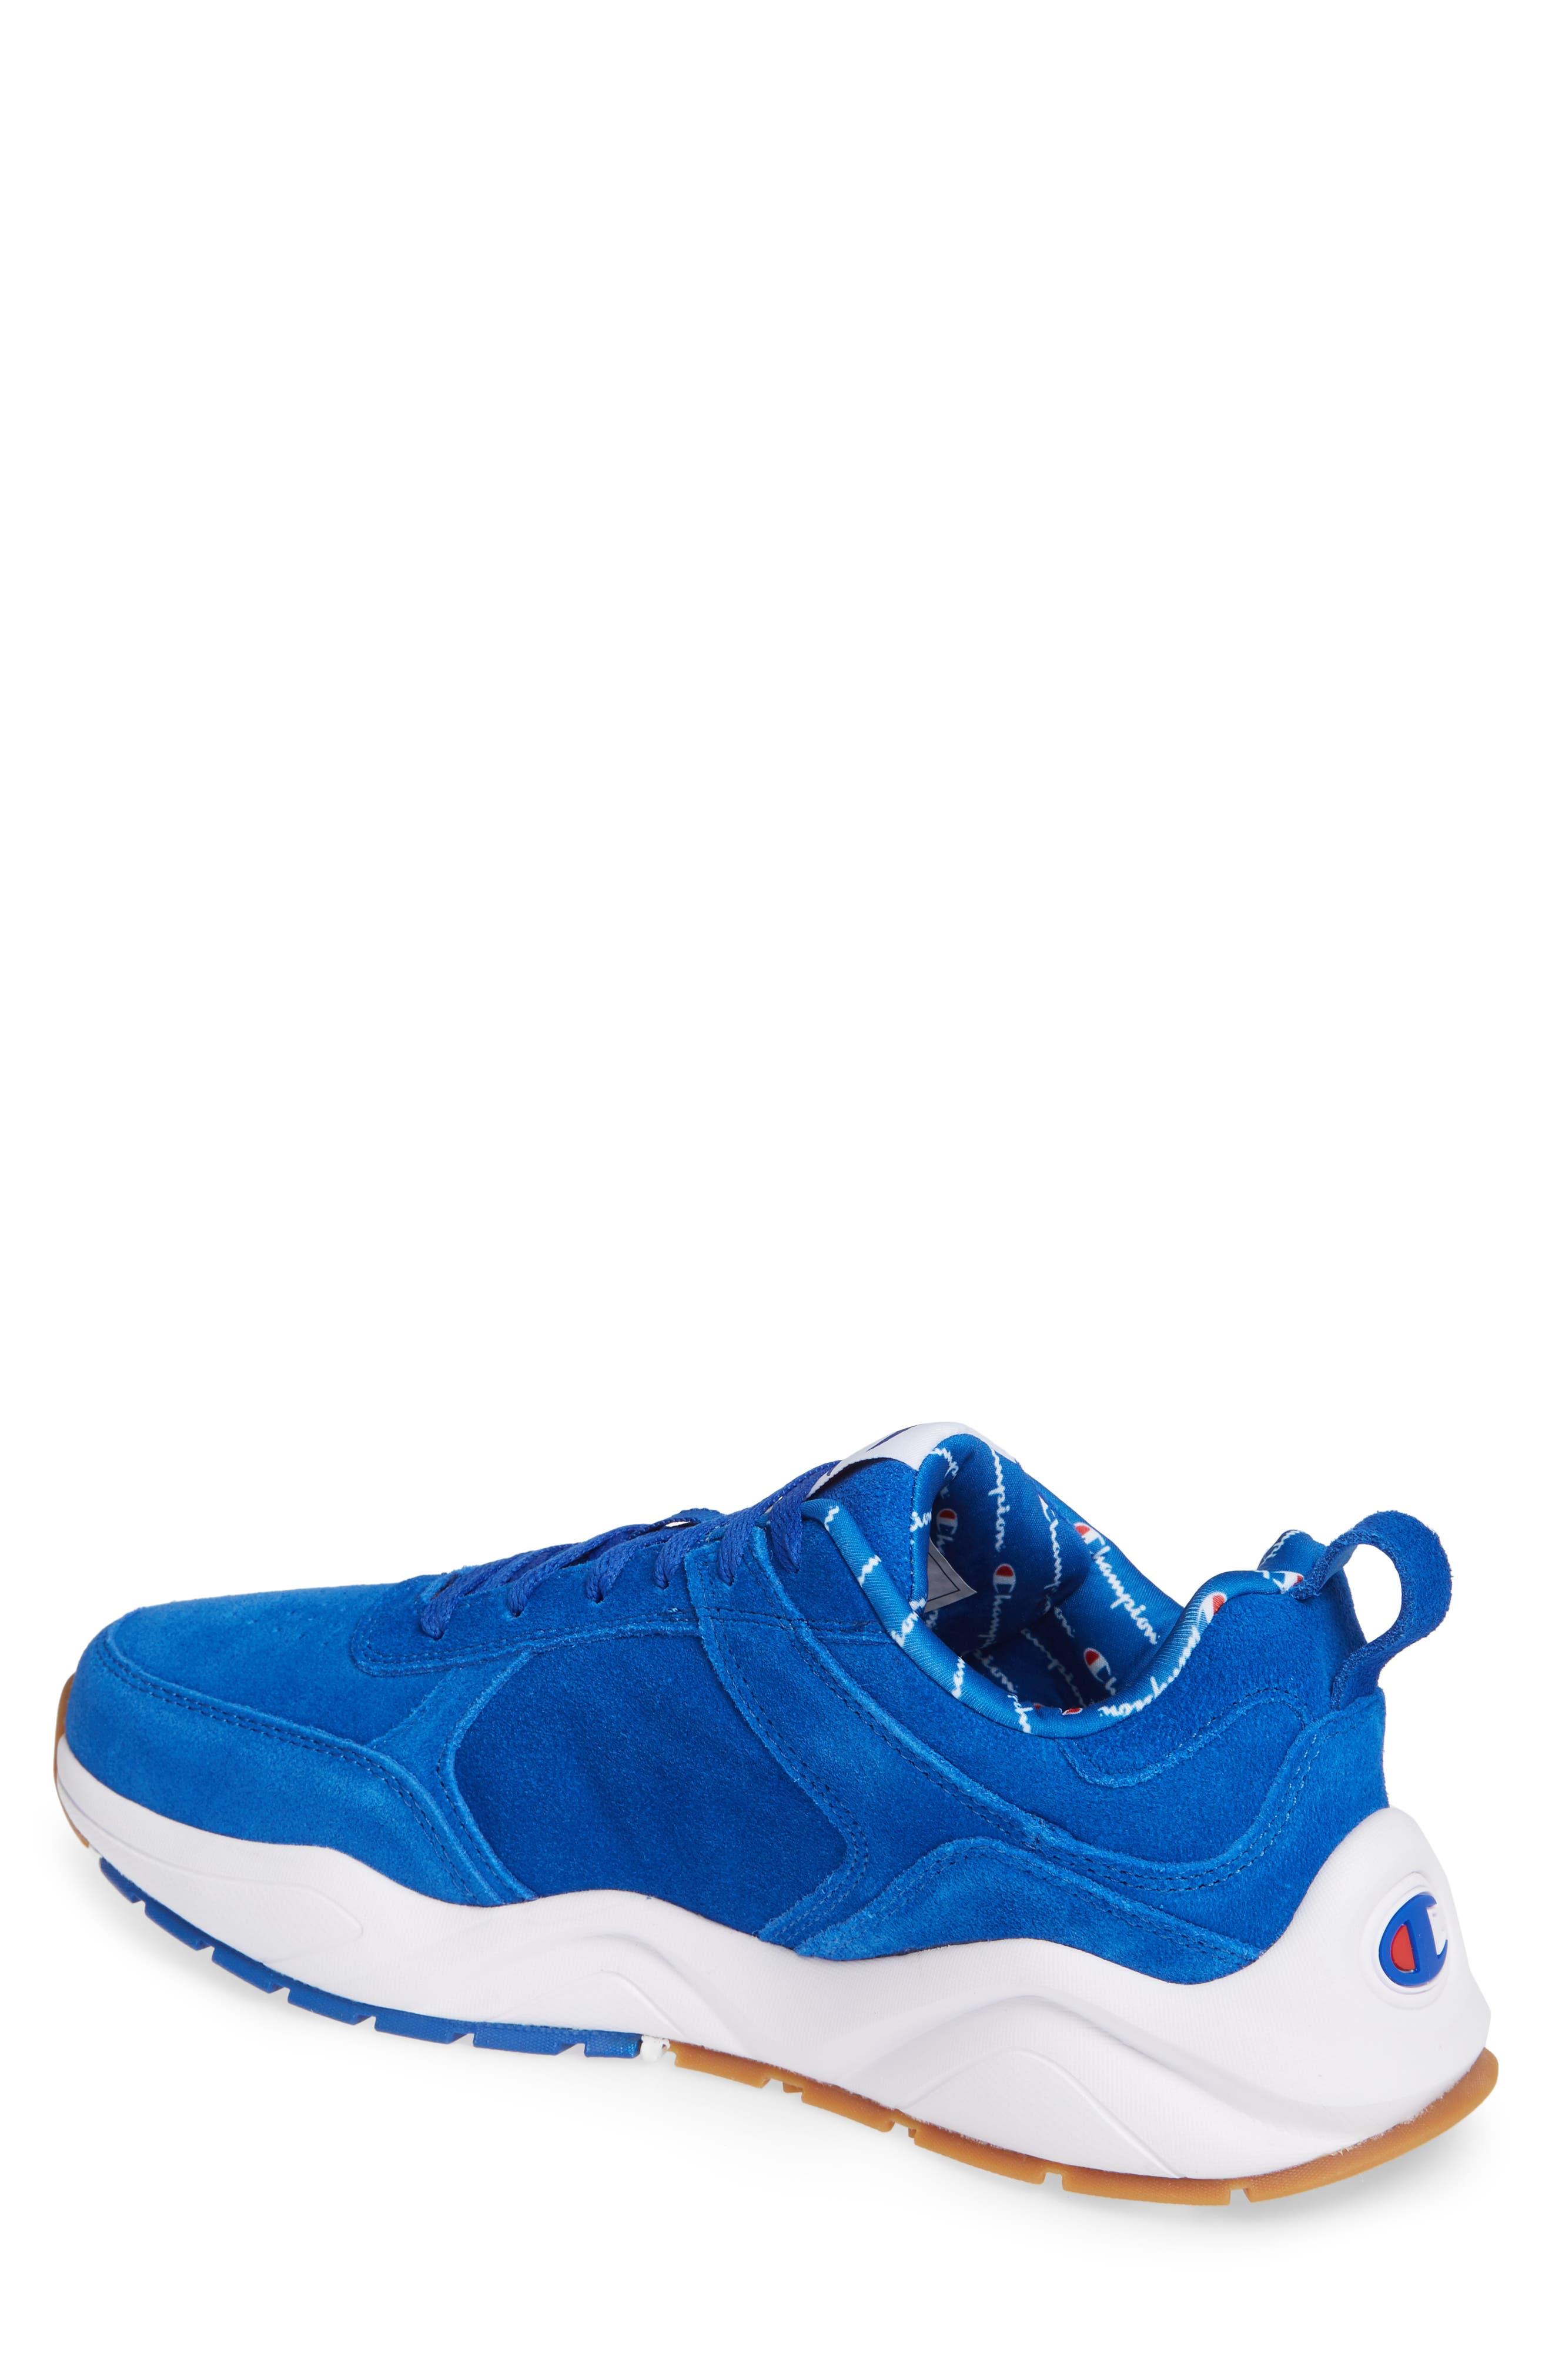 93Eighteen Sneaker,                             Alternate thumbnail 2, color,                             BLUE SUEDE